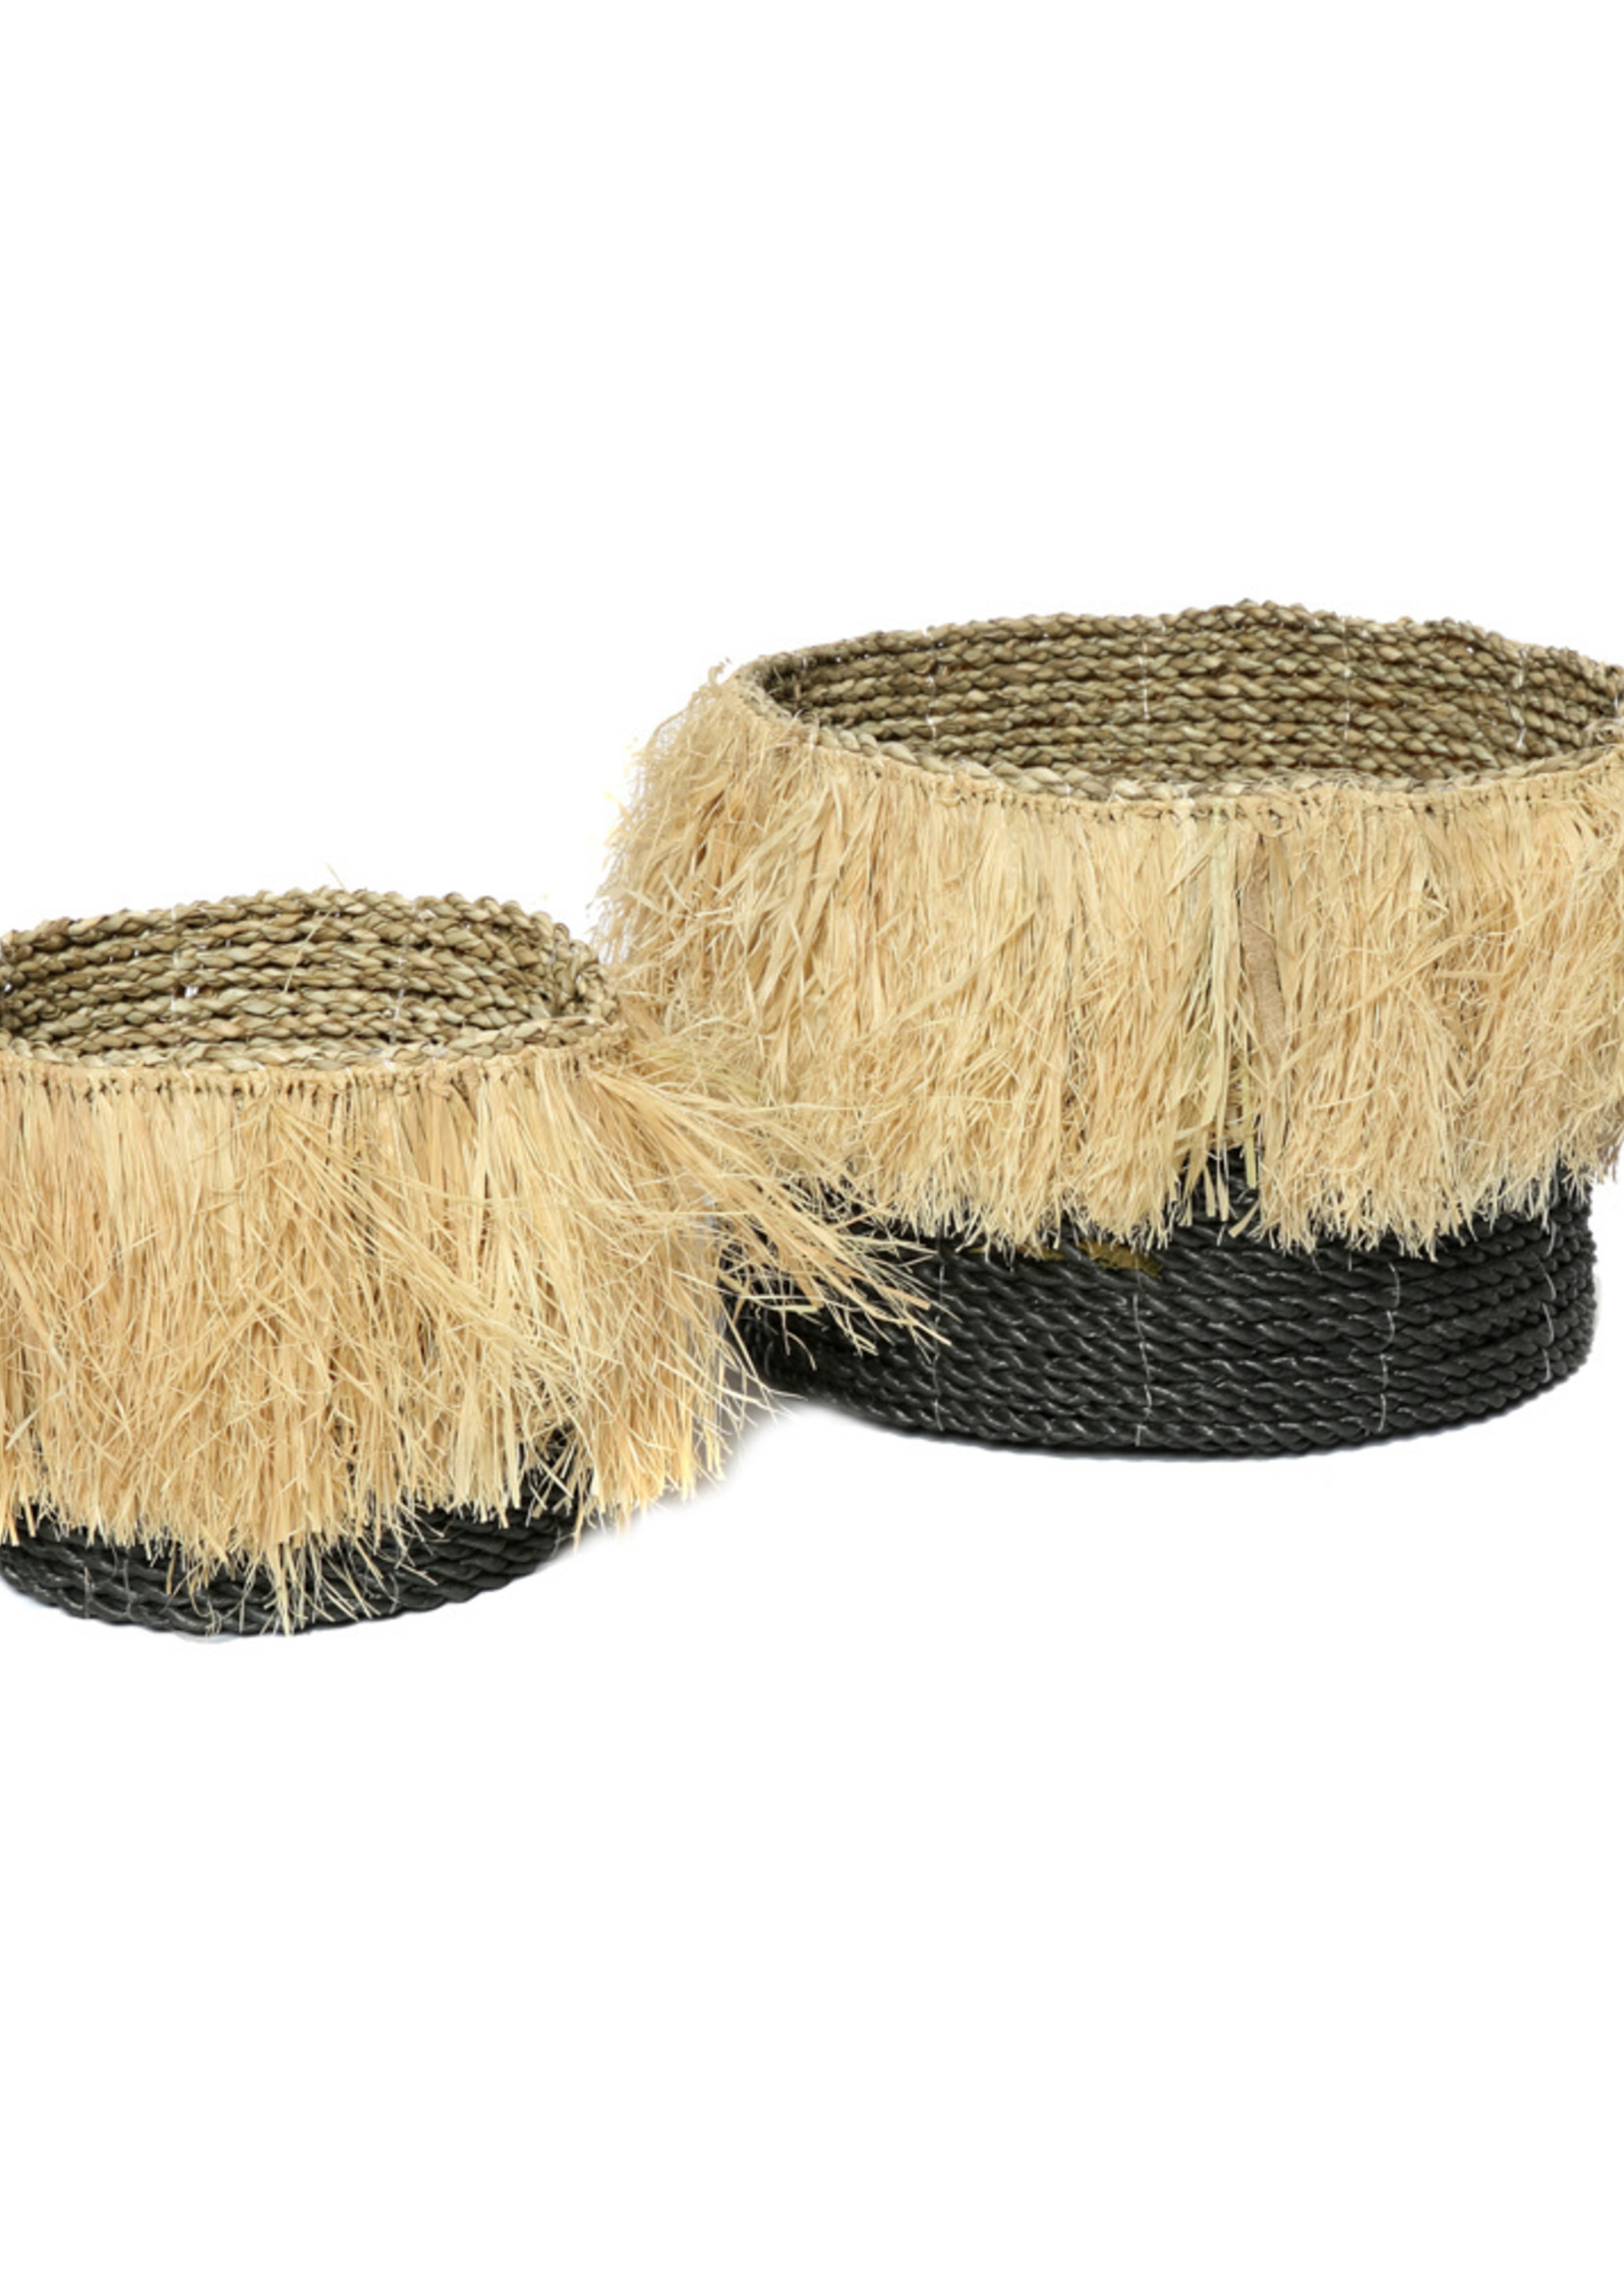 The Aloha Baskets - Black Natural - SET3